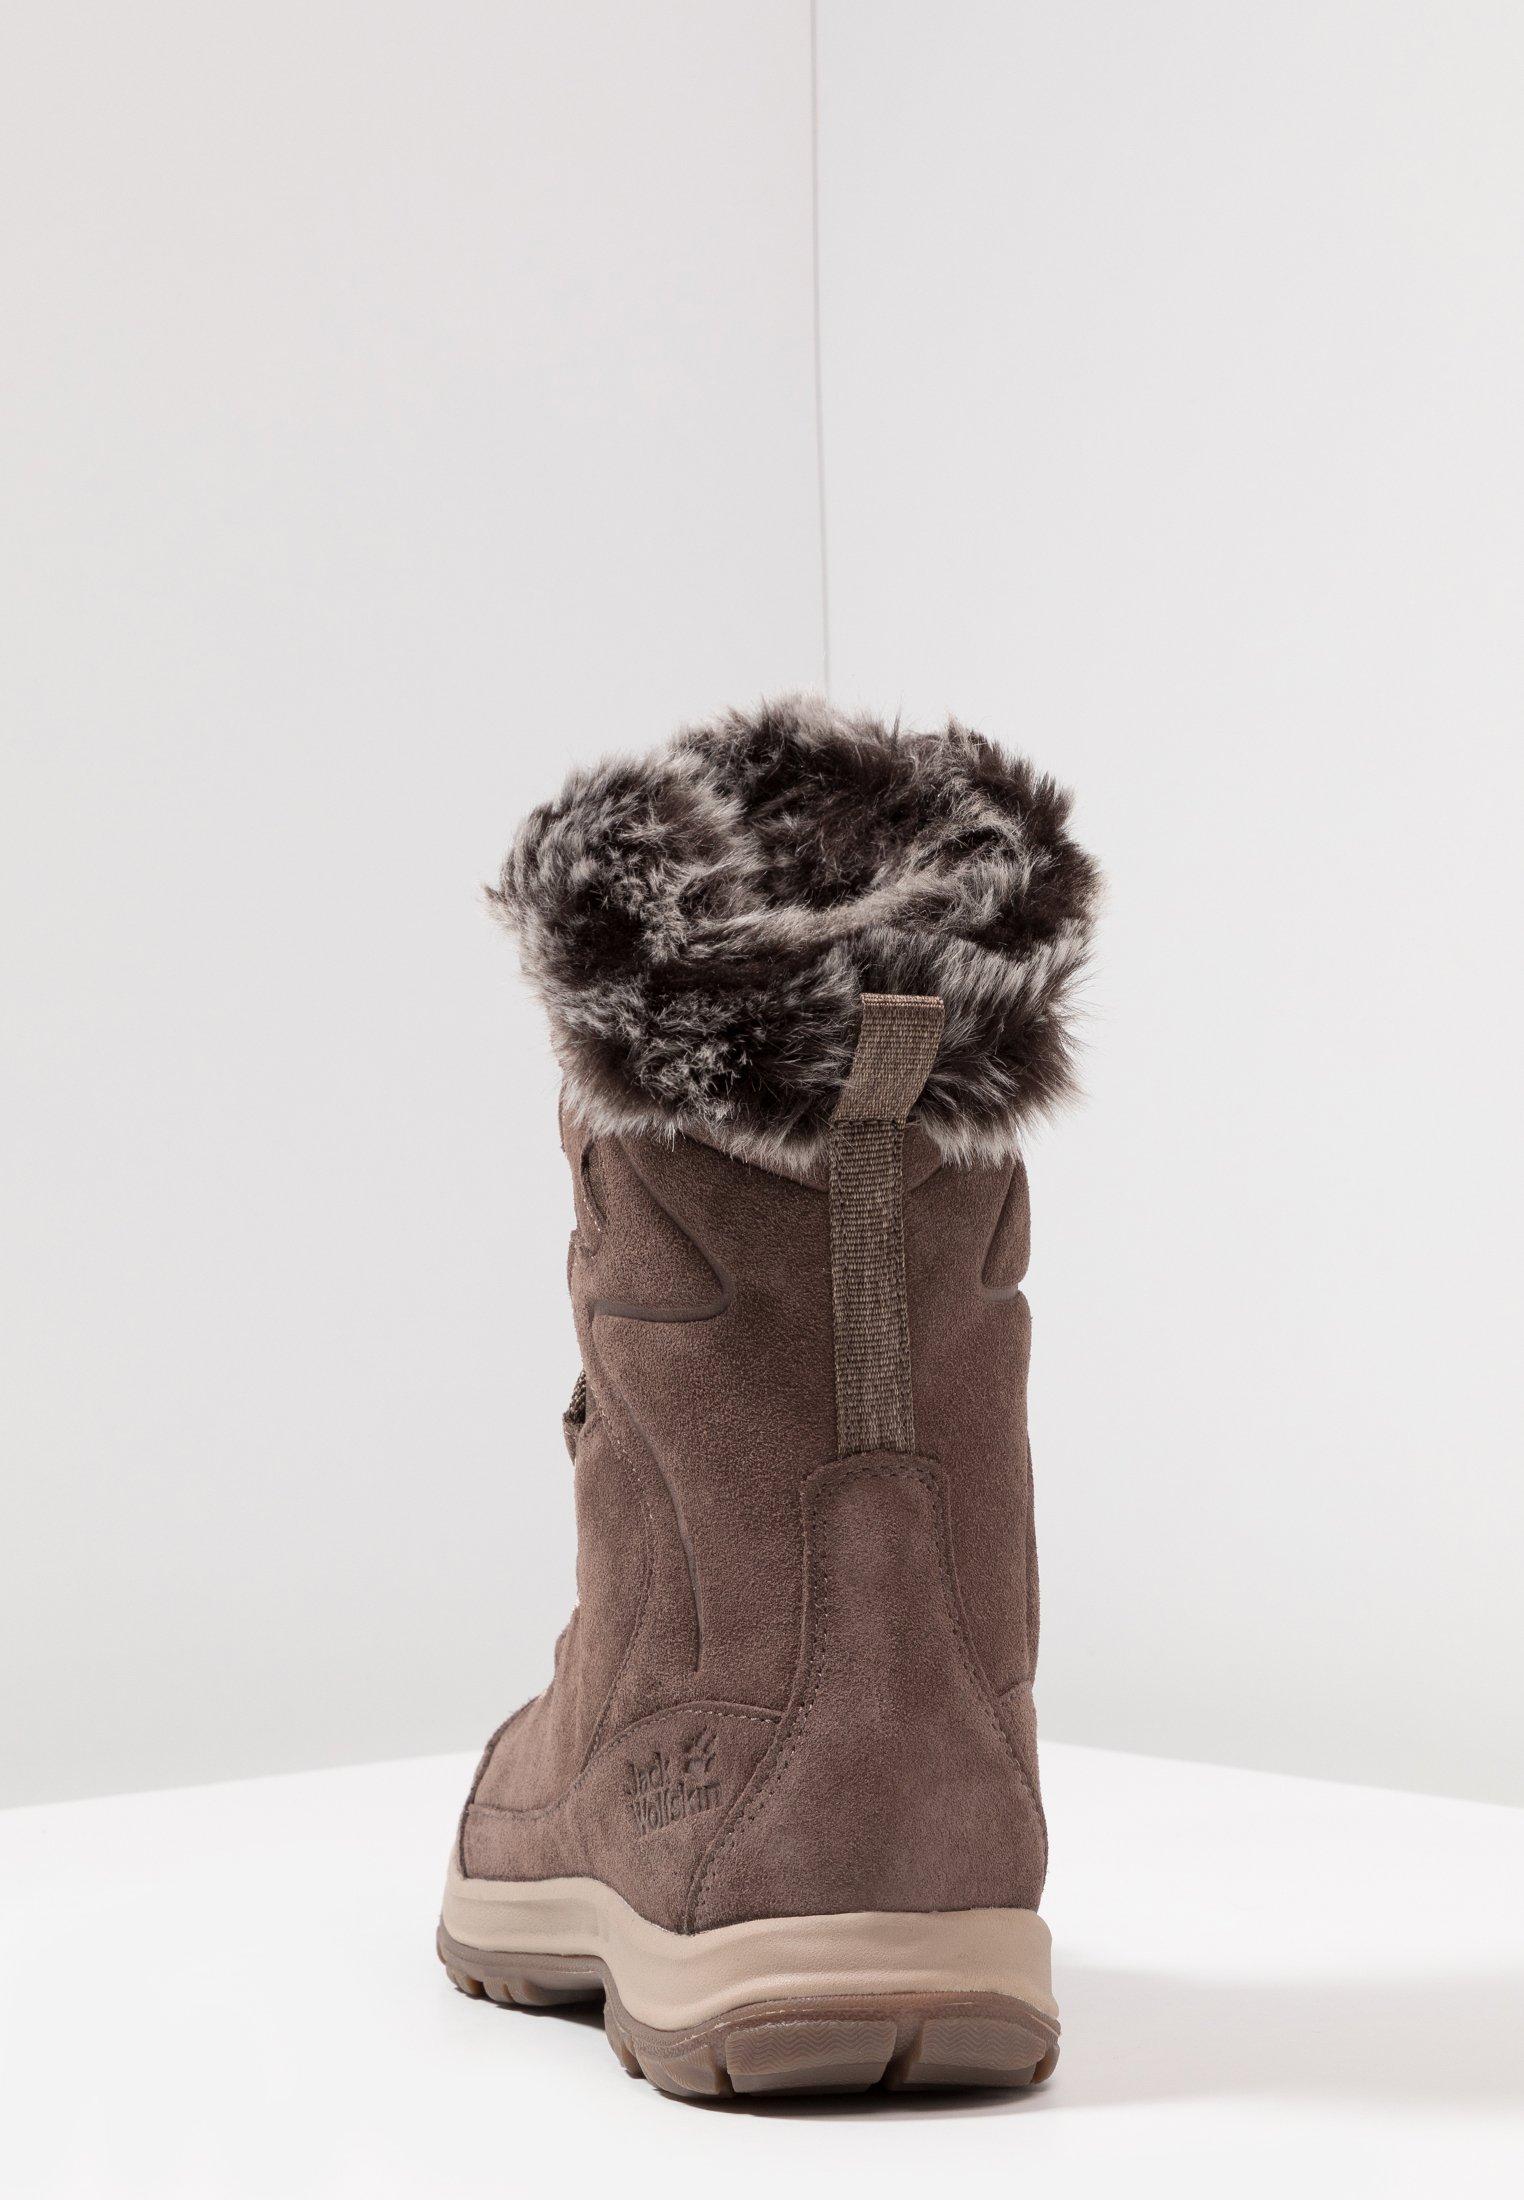 GLACIER BAY TEXAPORE HIGH SnowbootWinterstiefel moccabeige